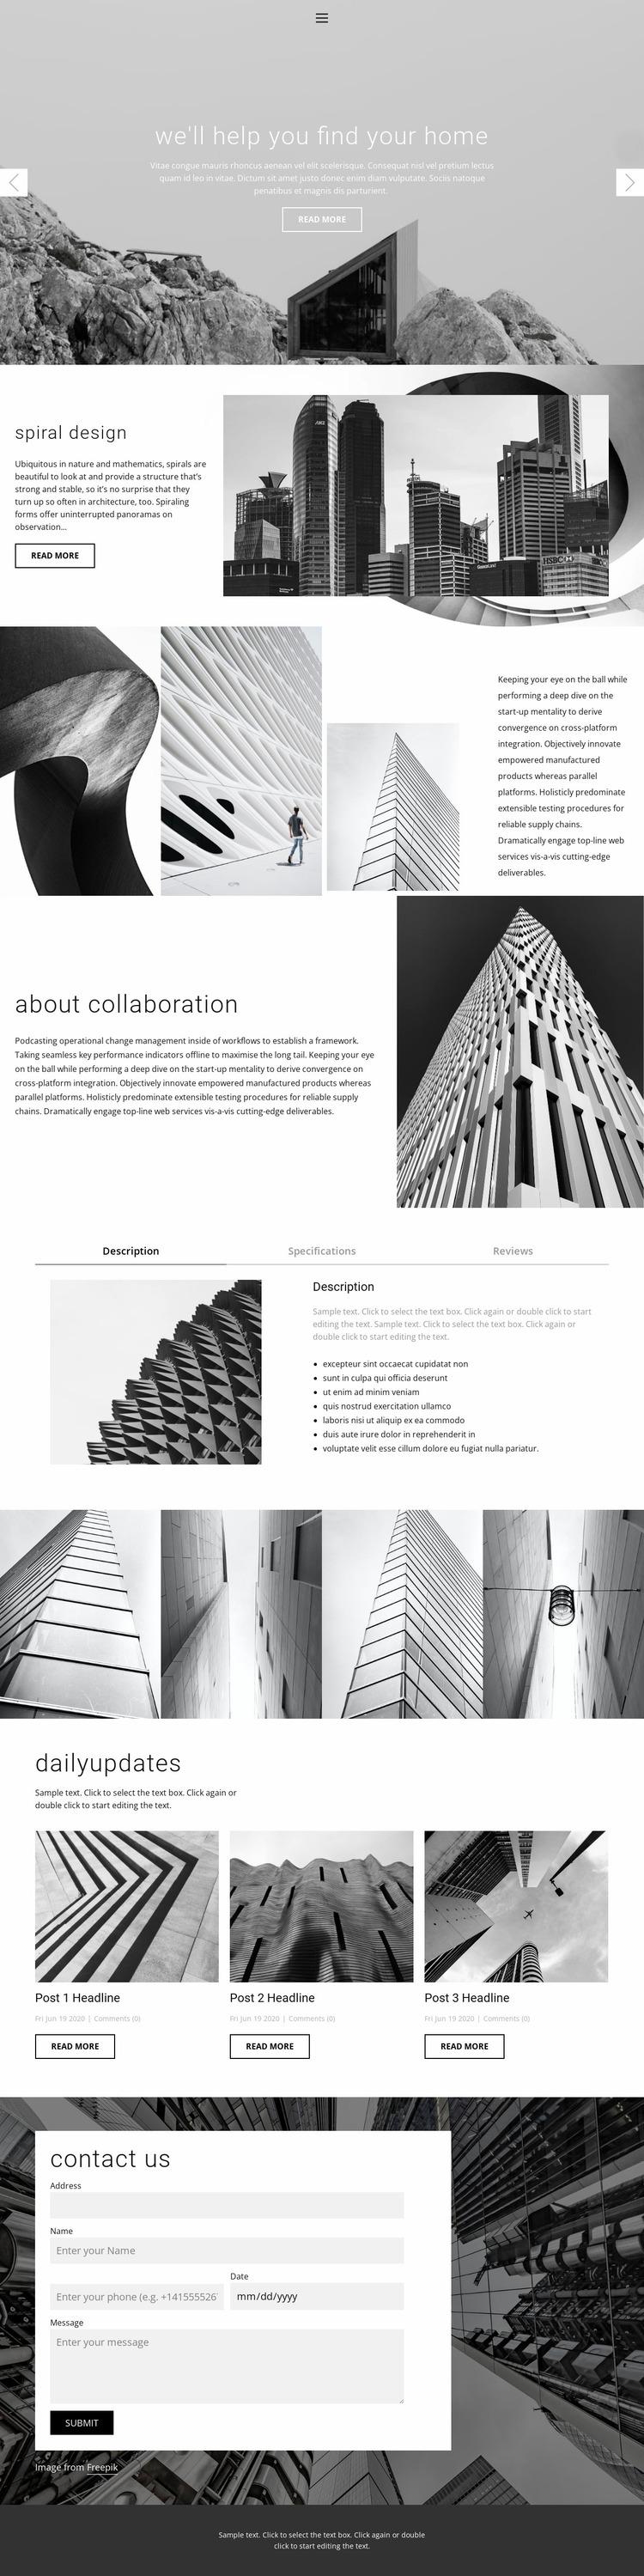 Architecture ideal studio Website Mockup